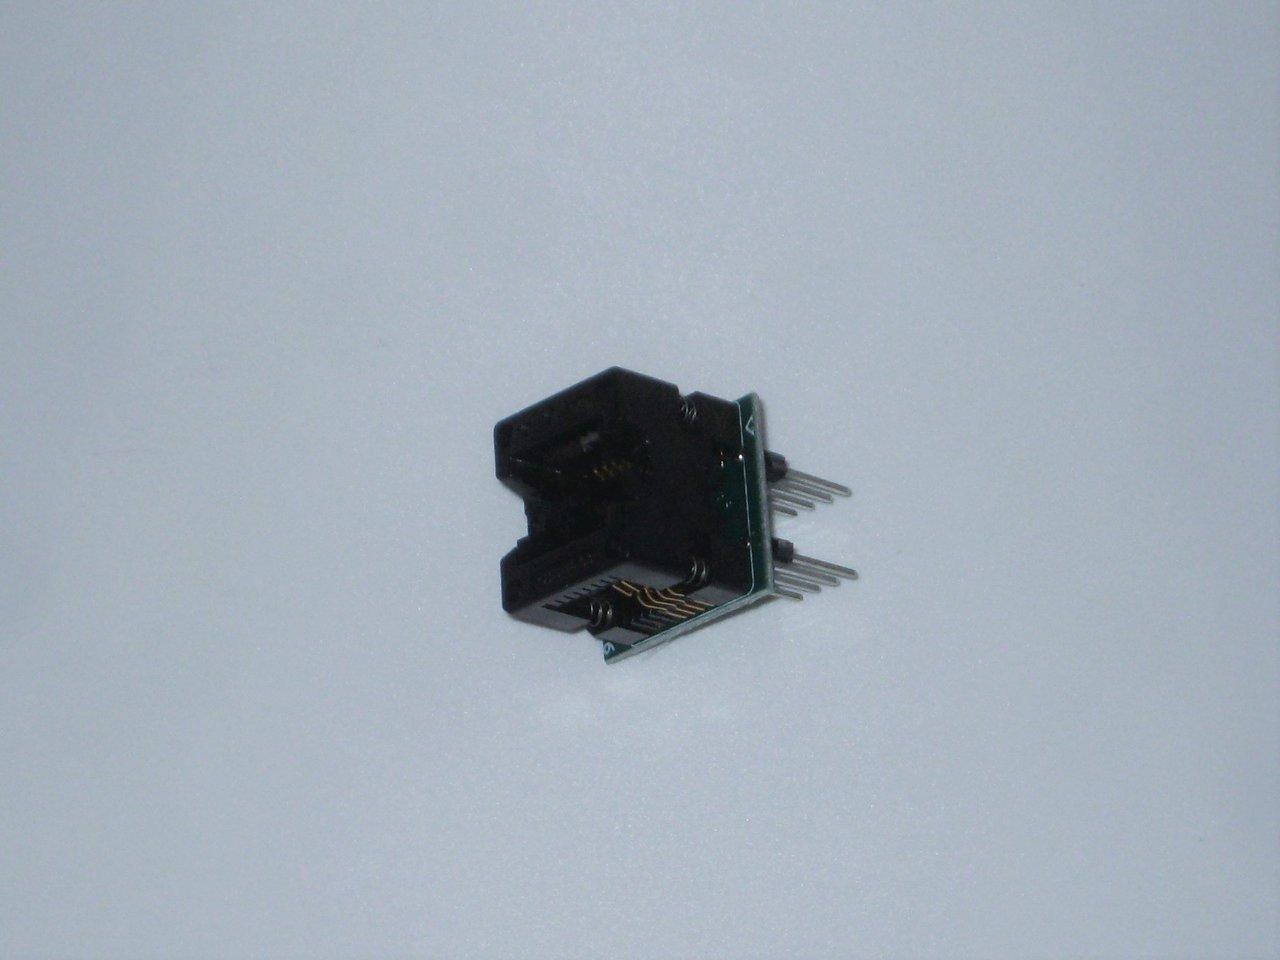 Адаптер DIP для установки микросхем в корпусе SOIC8